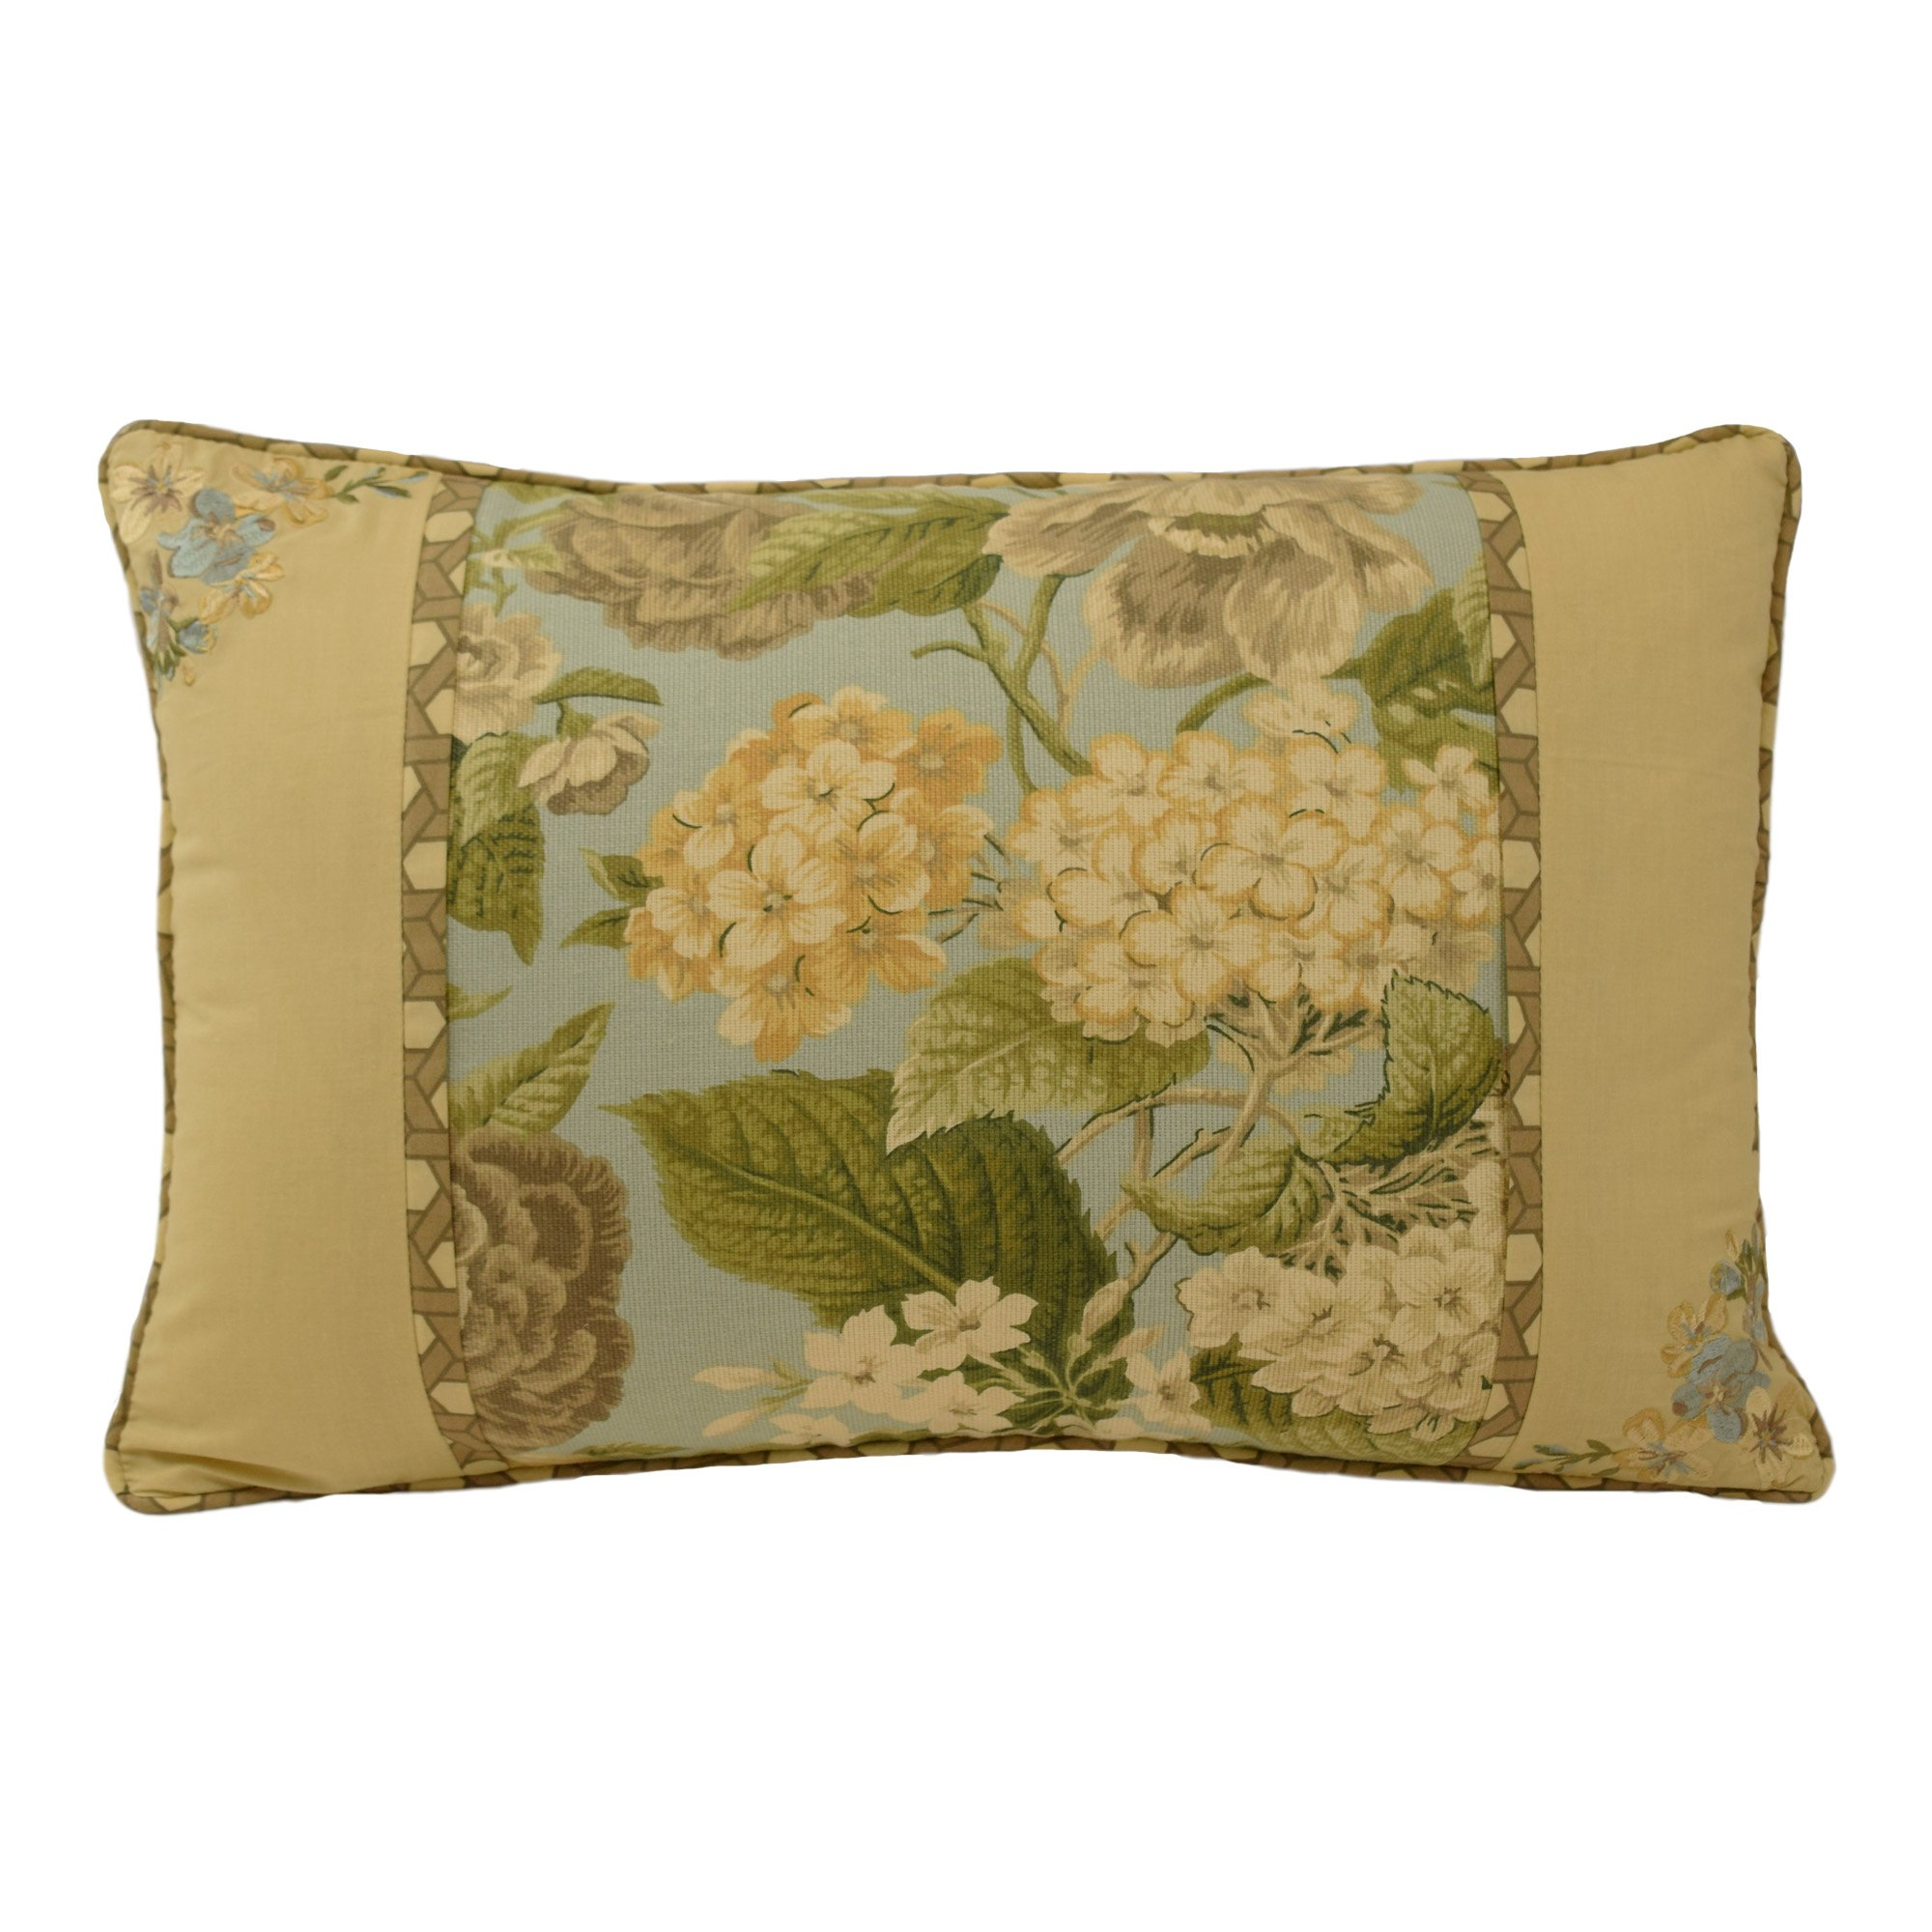 Waverly Garden Glory Decorative Pillow, 20''x14'', Mist